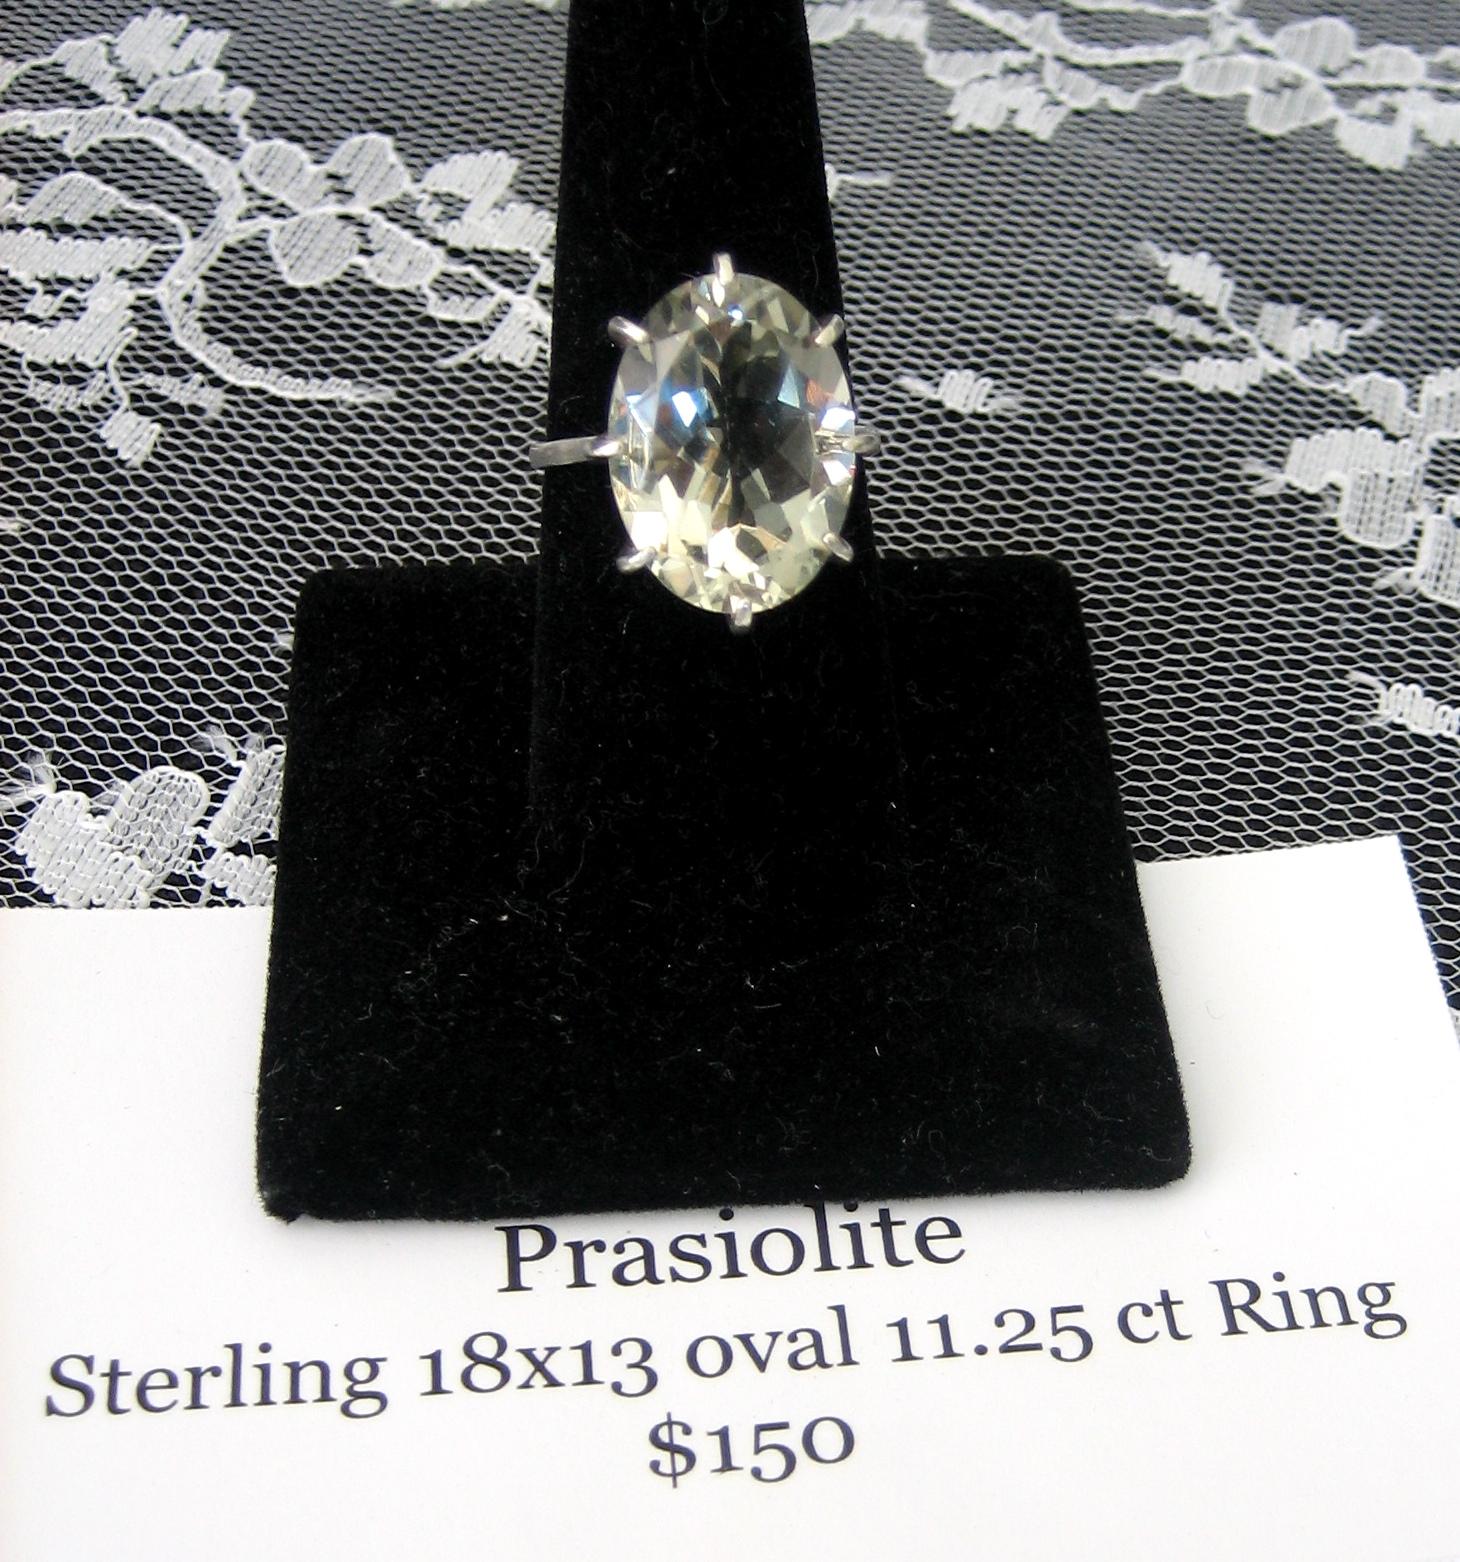 Gemstones Unlimited